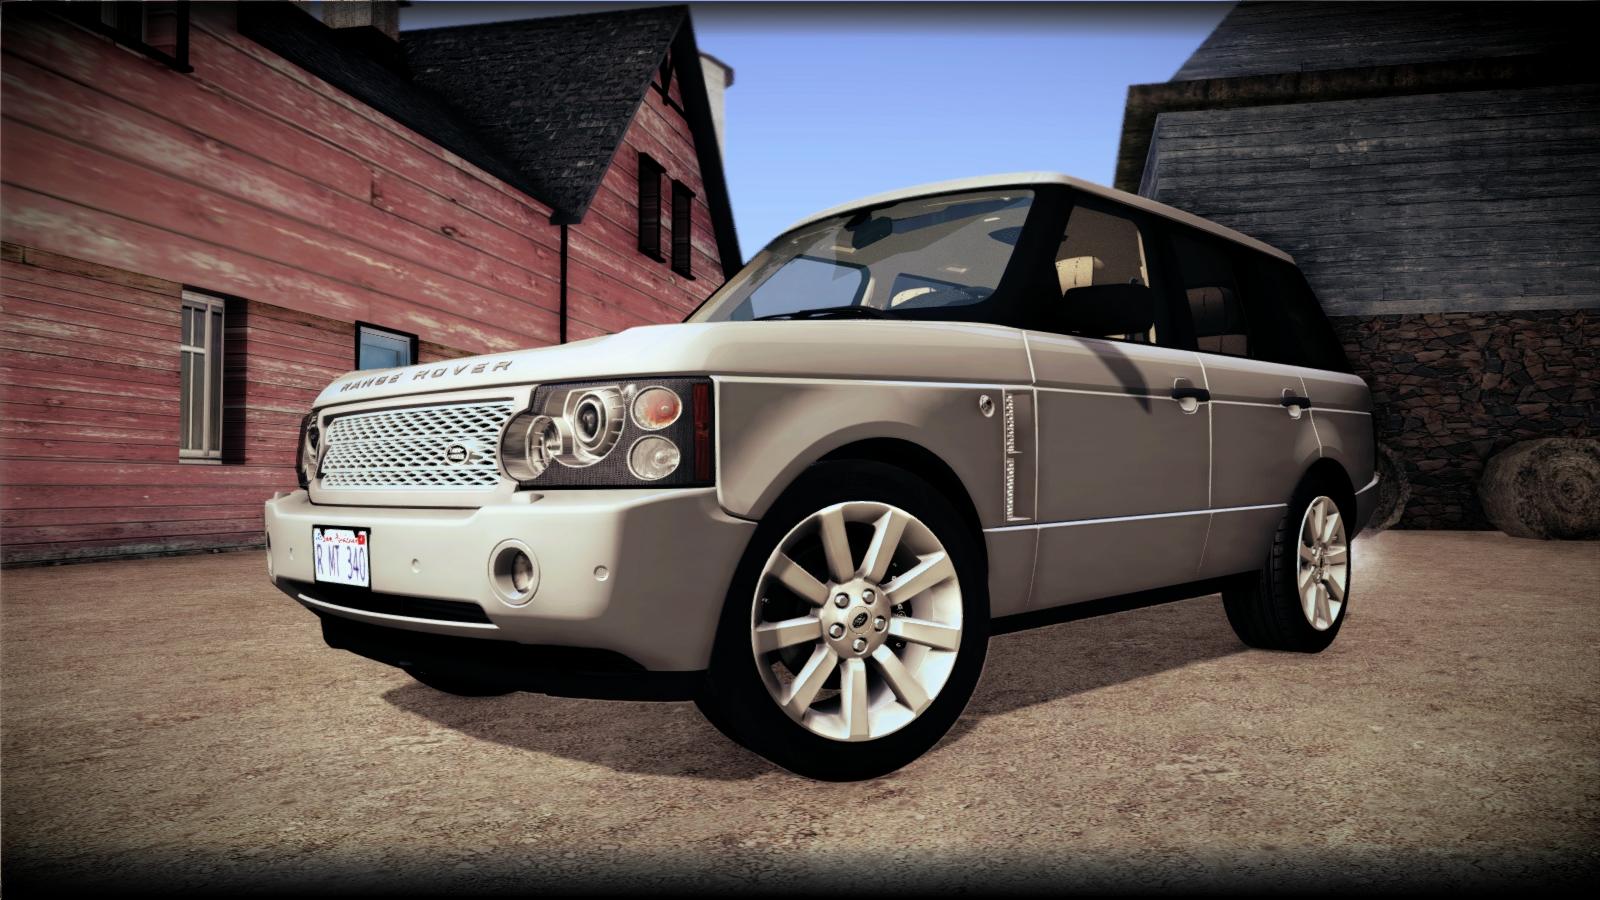 Matheus340 Land Rover Range Rover Supercharged 2008